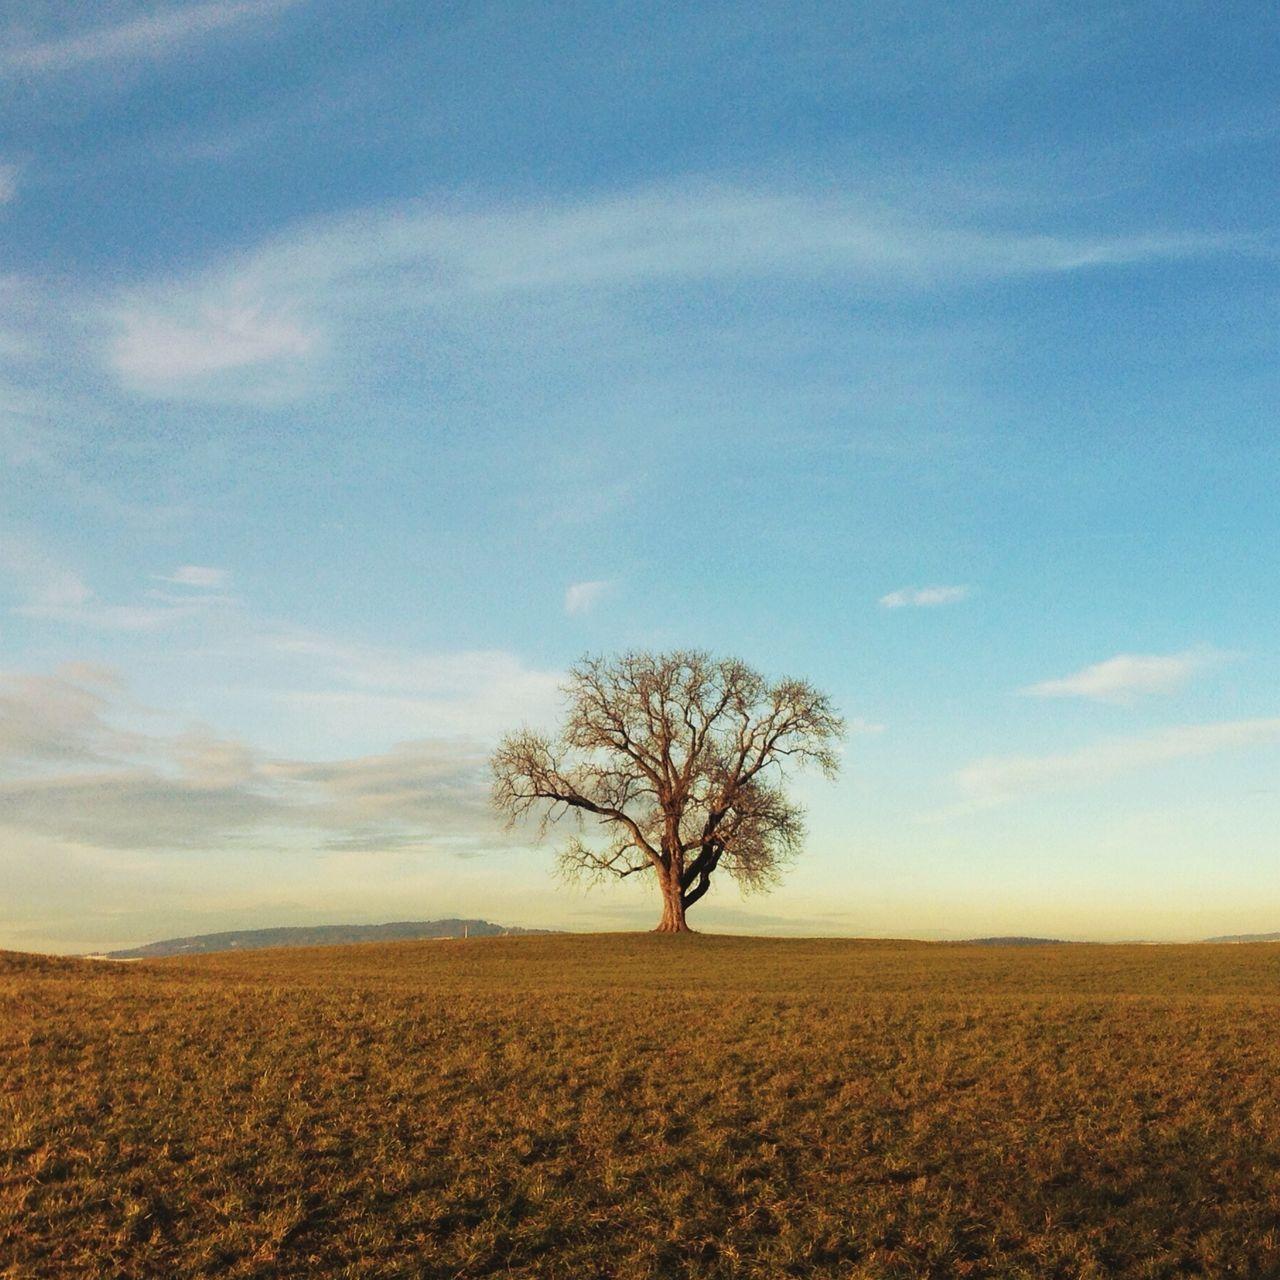 Bare tree on grassy landscape against sky